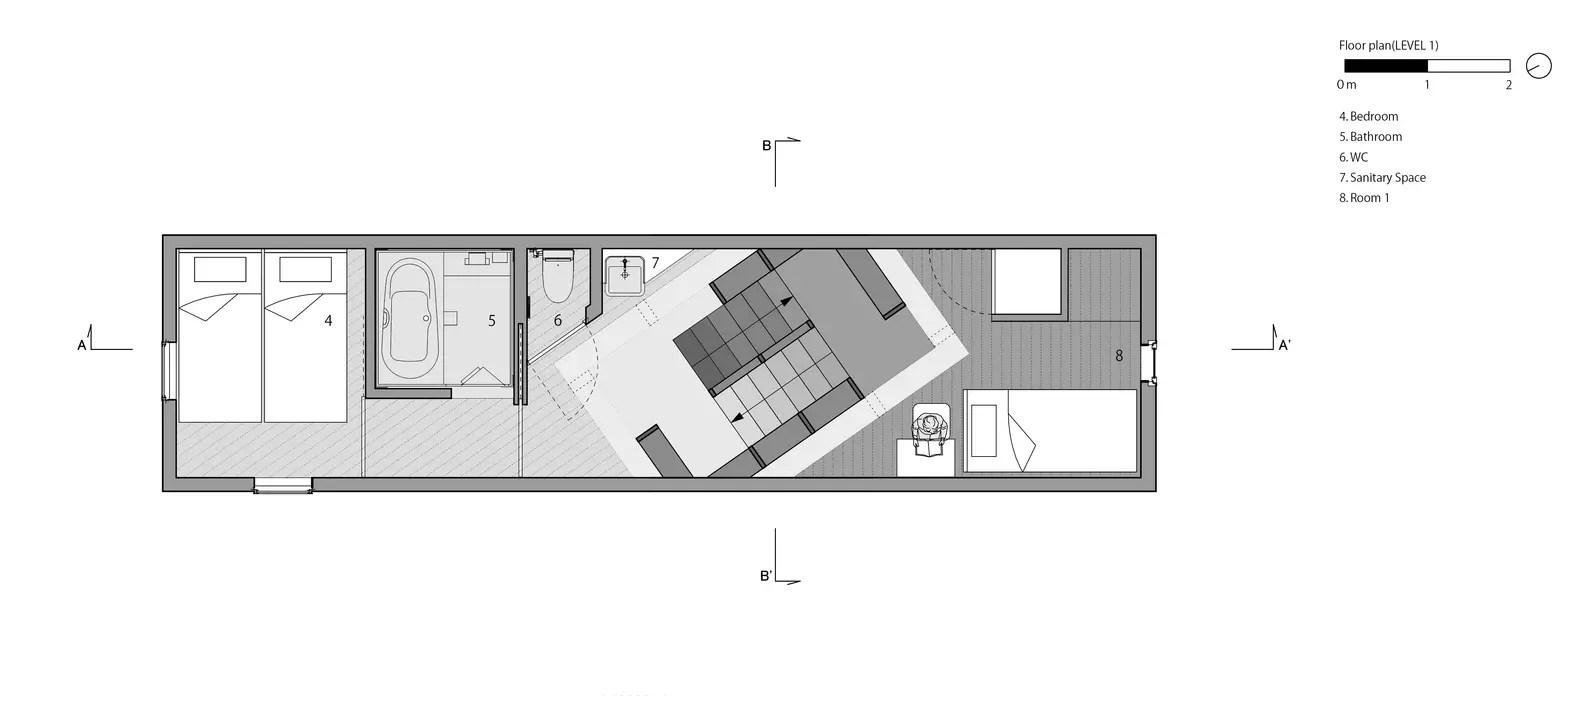 House_in_tezukayama_plan02_1f_level1_eng